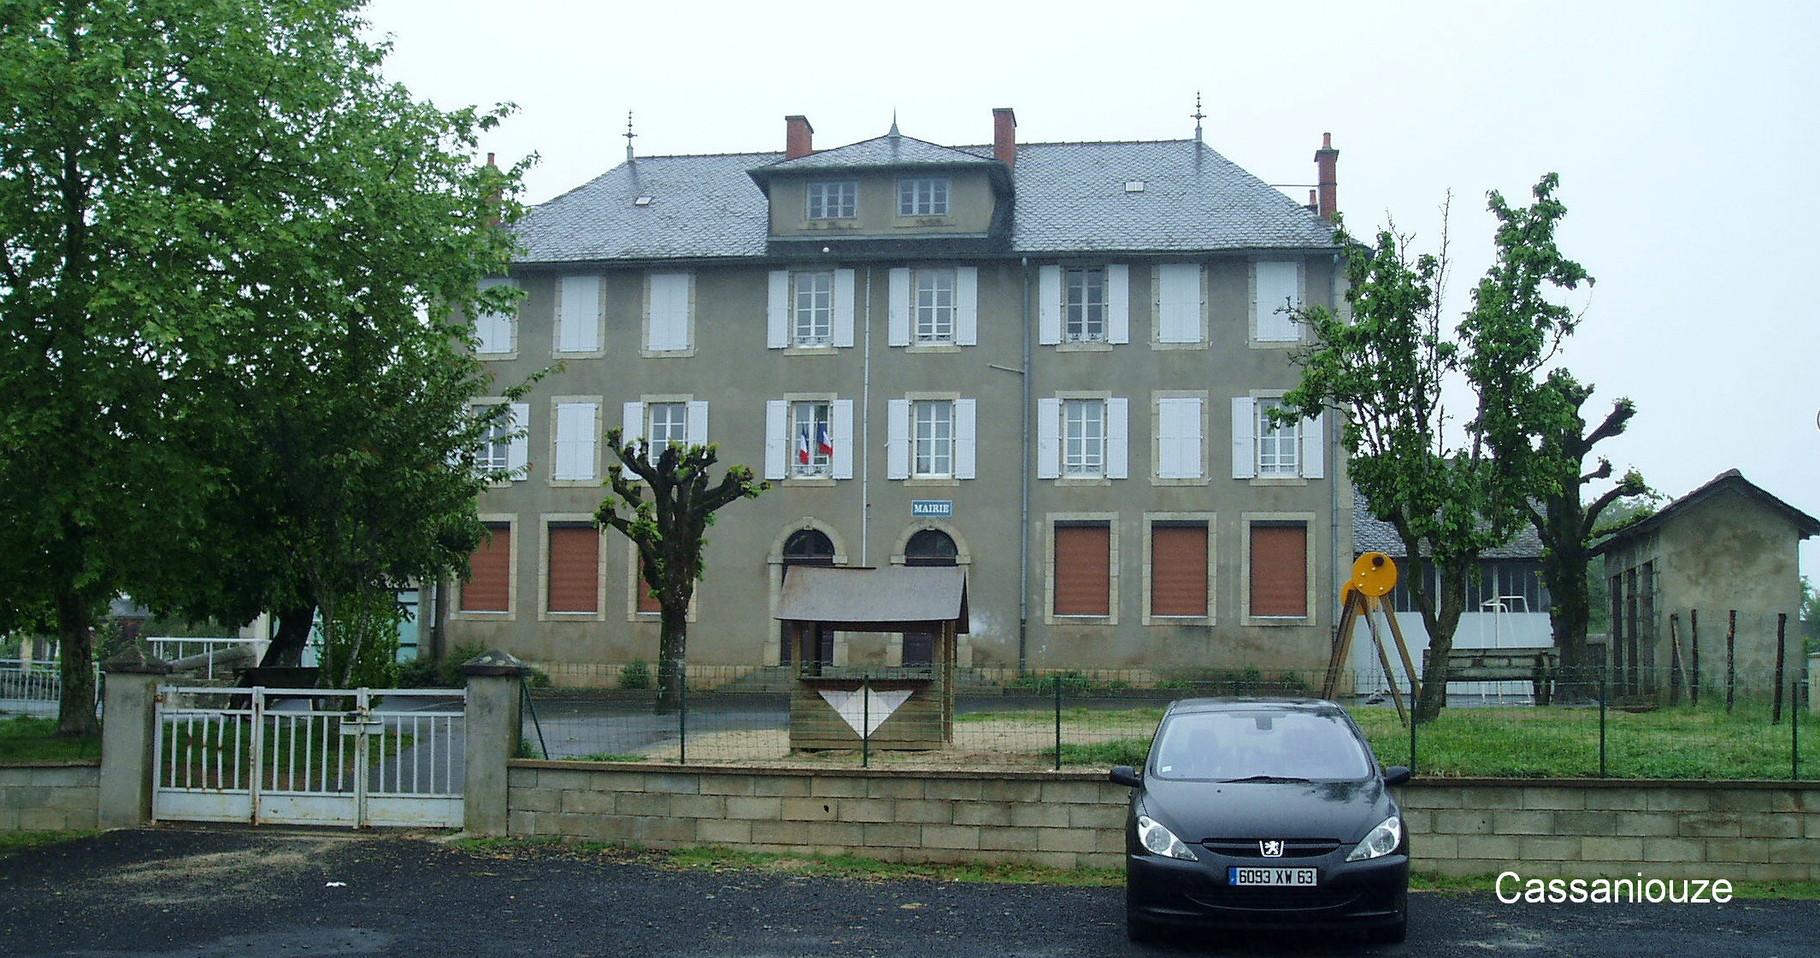 Ecole de Cassaniouze